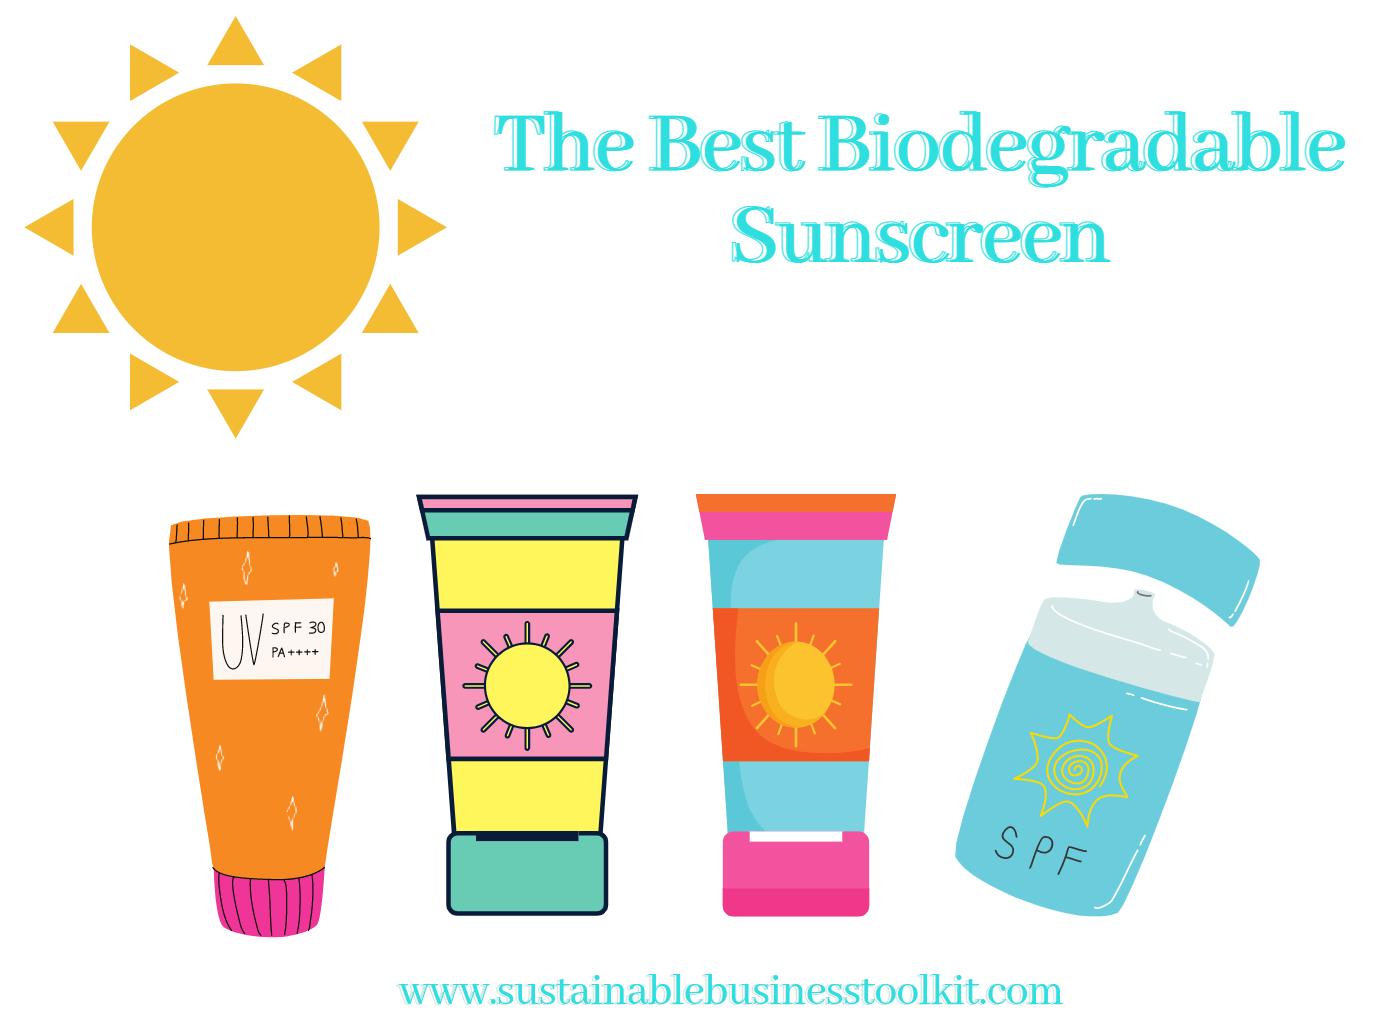 The Best Biodegradable Sunscreen